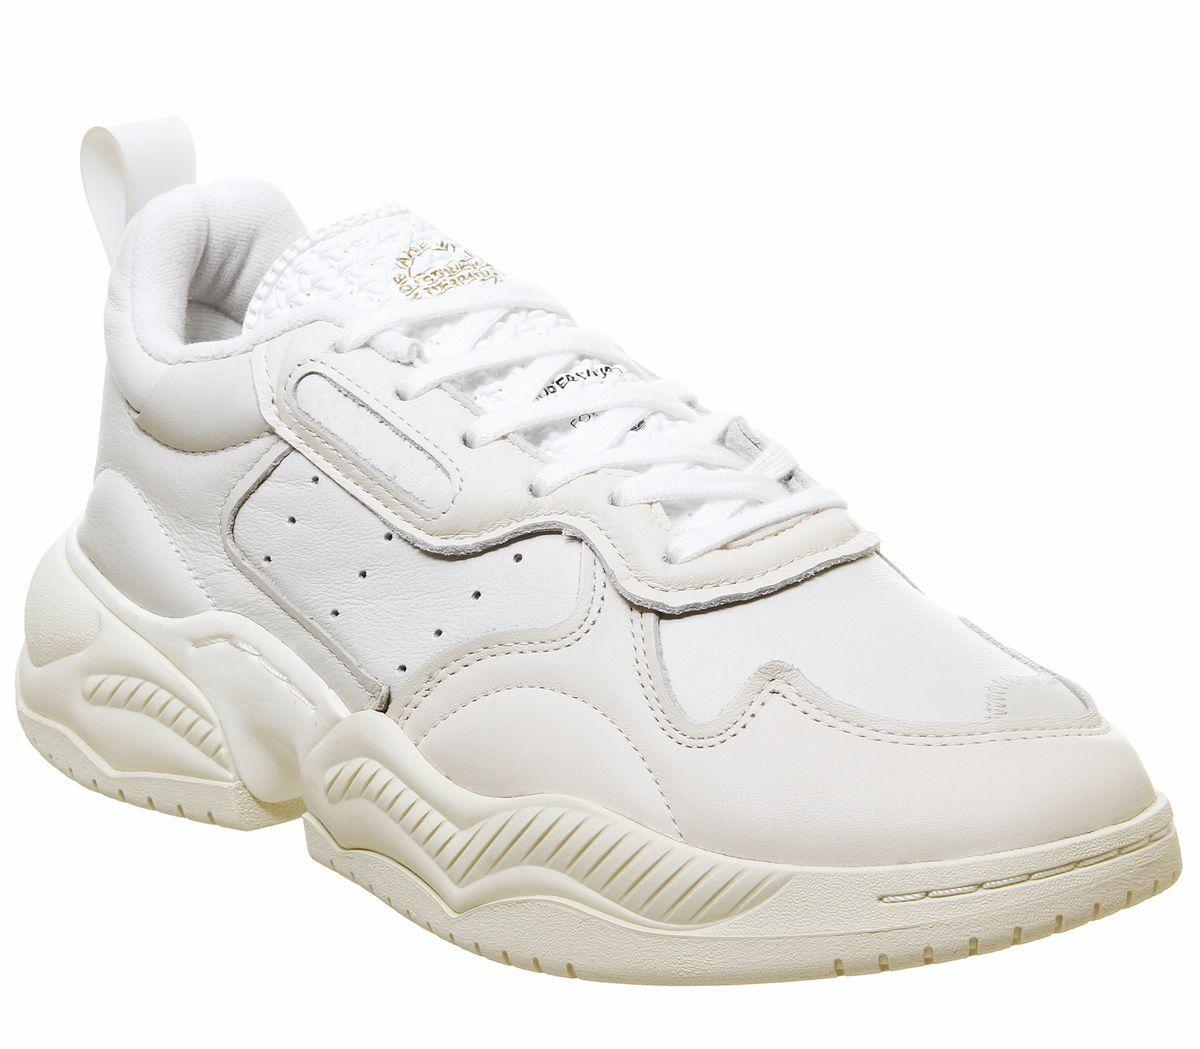 Homme Adidas Supercourt 90 S Baskets blanc écru Baskets chaussures